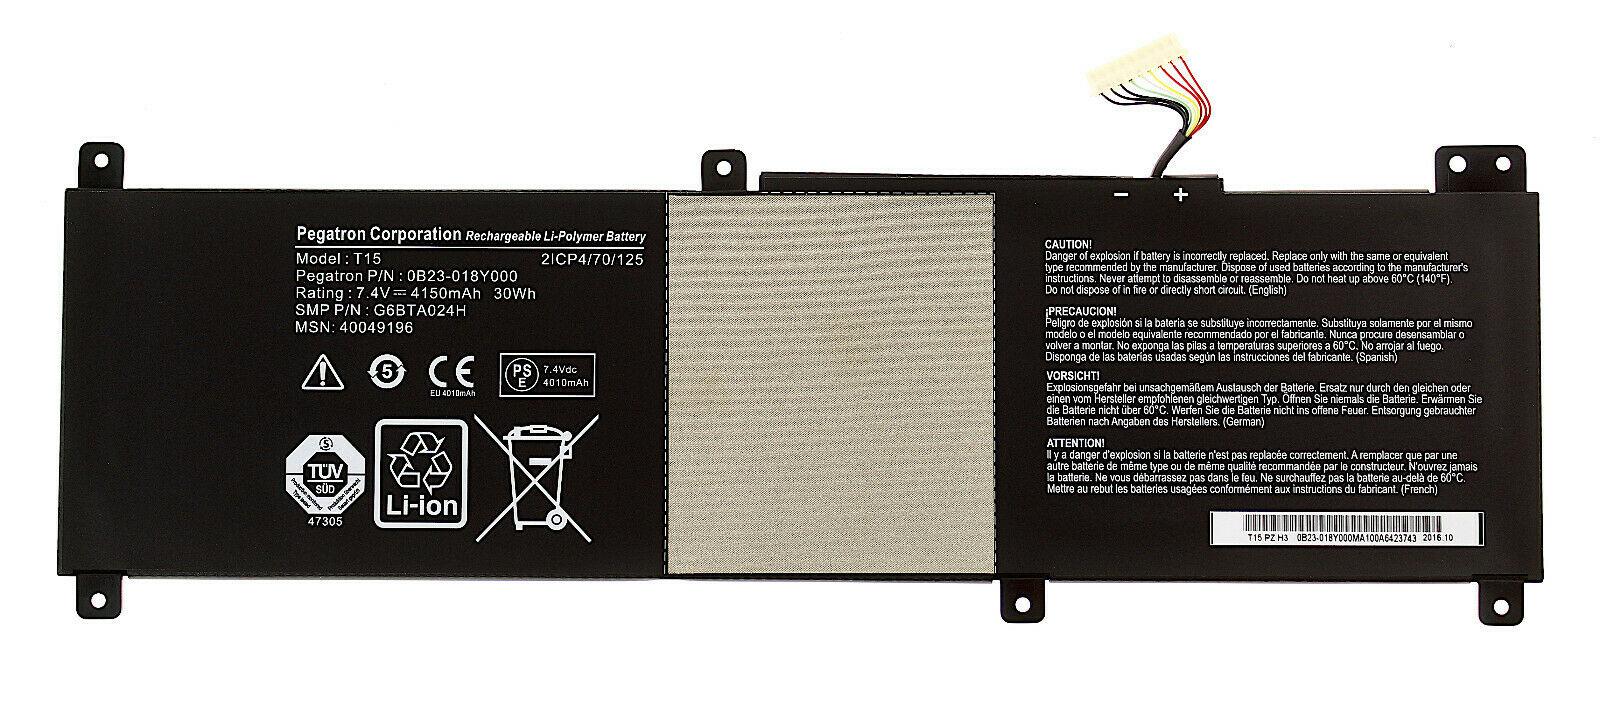 Akku für 7.4V 4150mAh Medion S6213T S6214T S6413T T15 0B23-018Y000 (Ersatz)